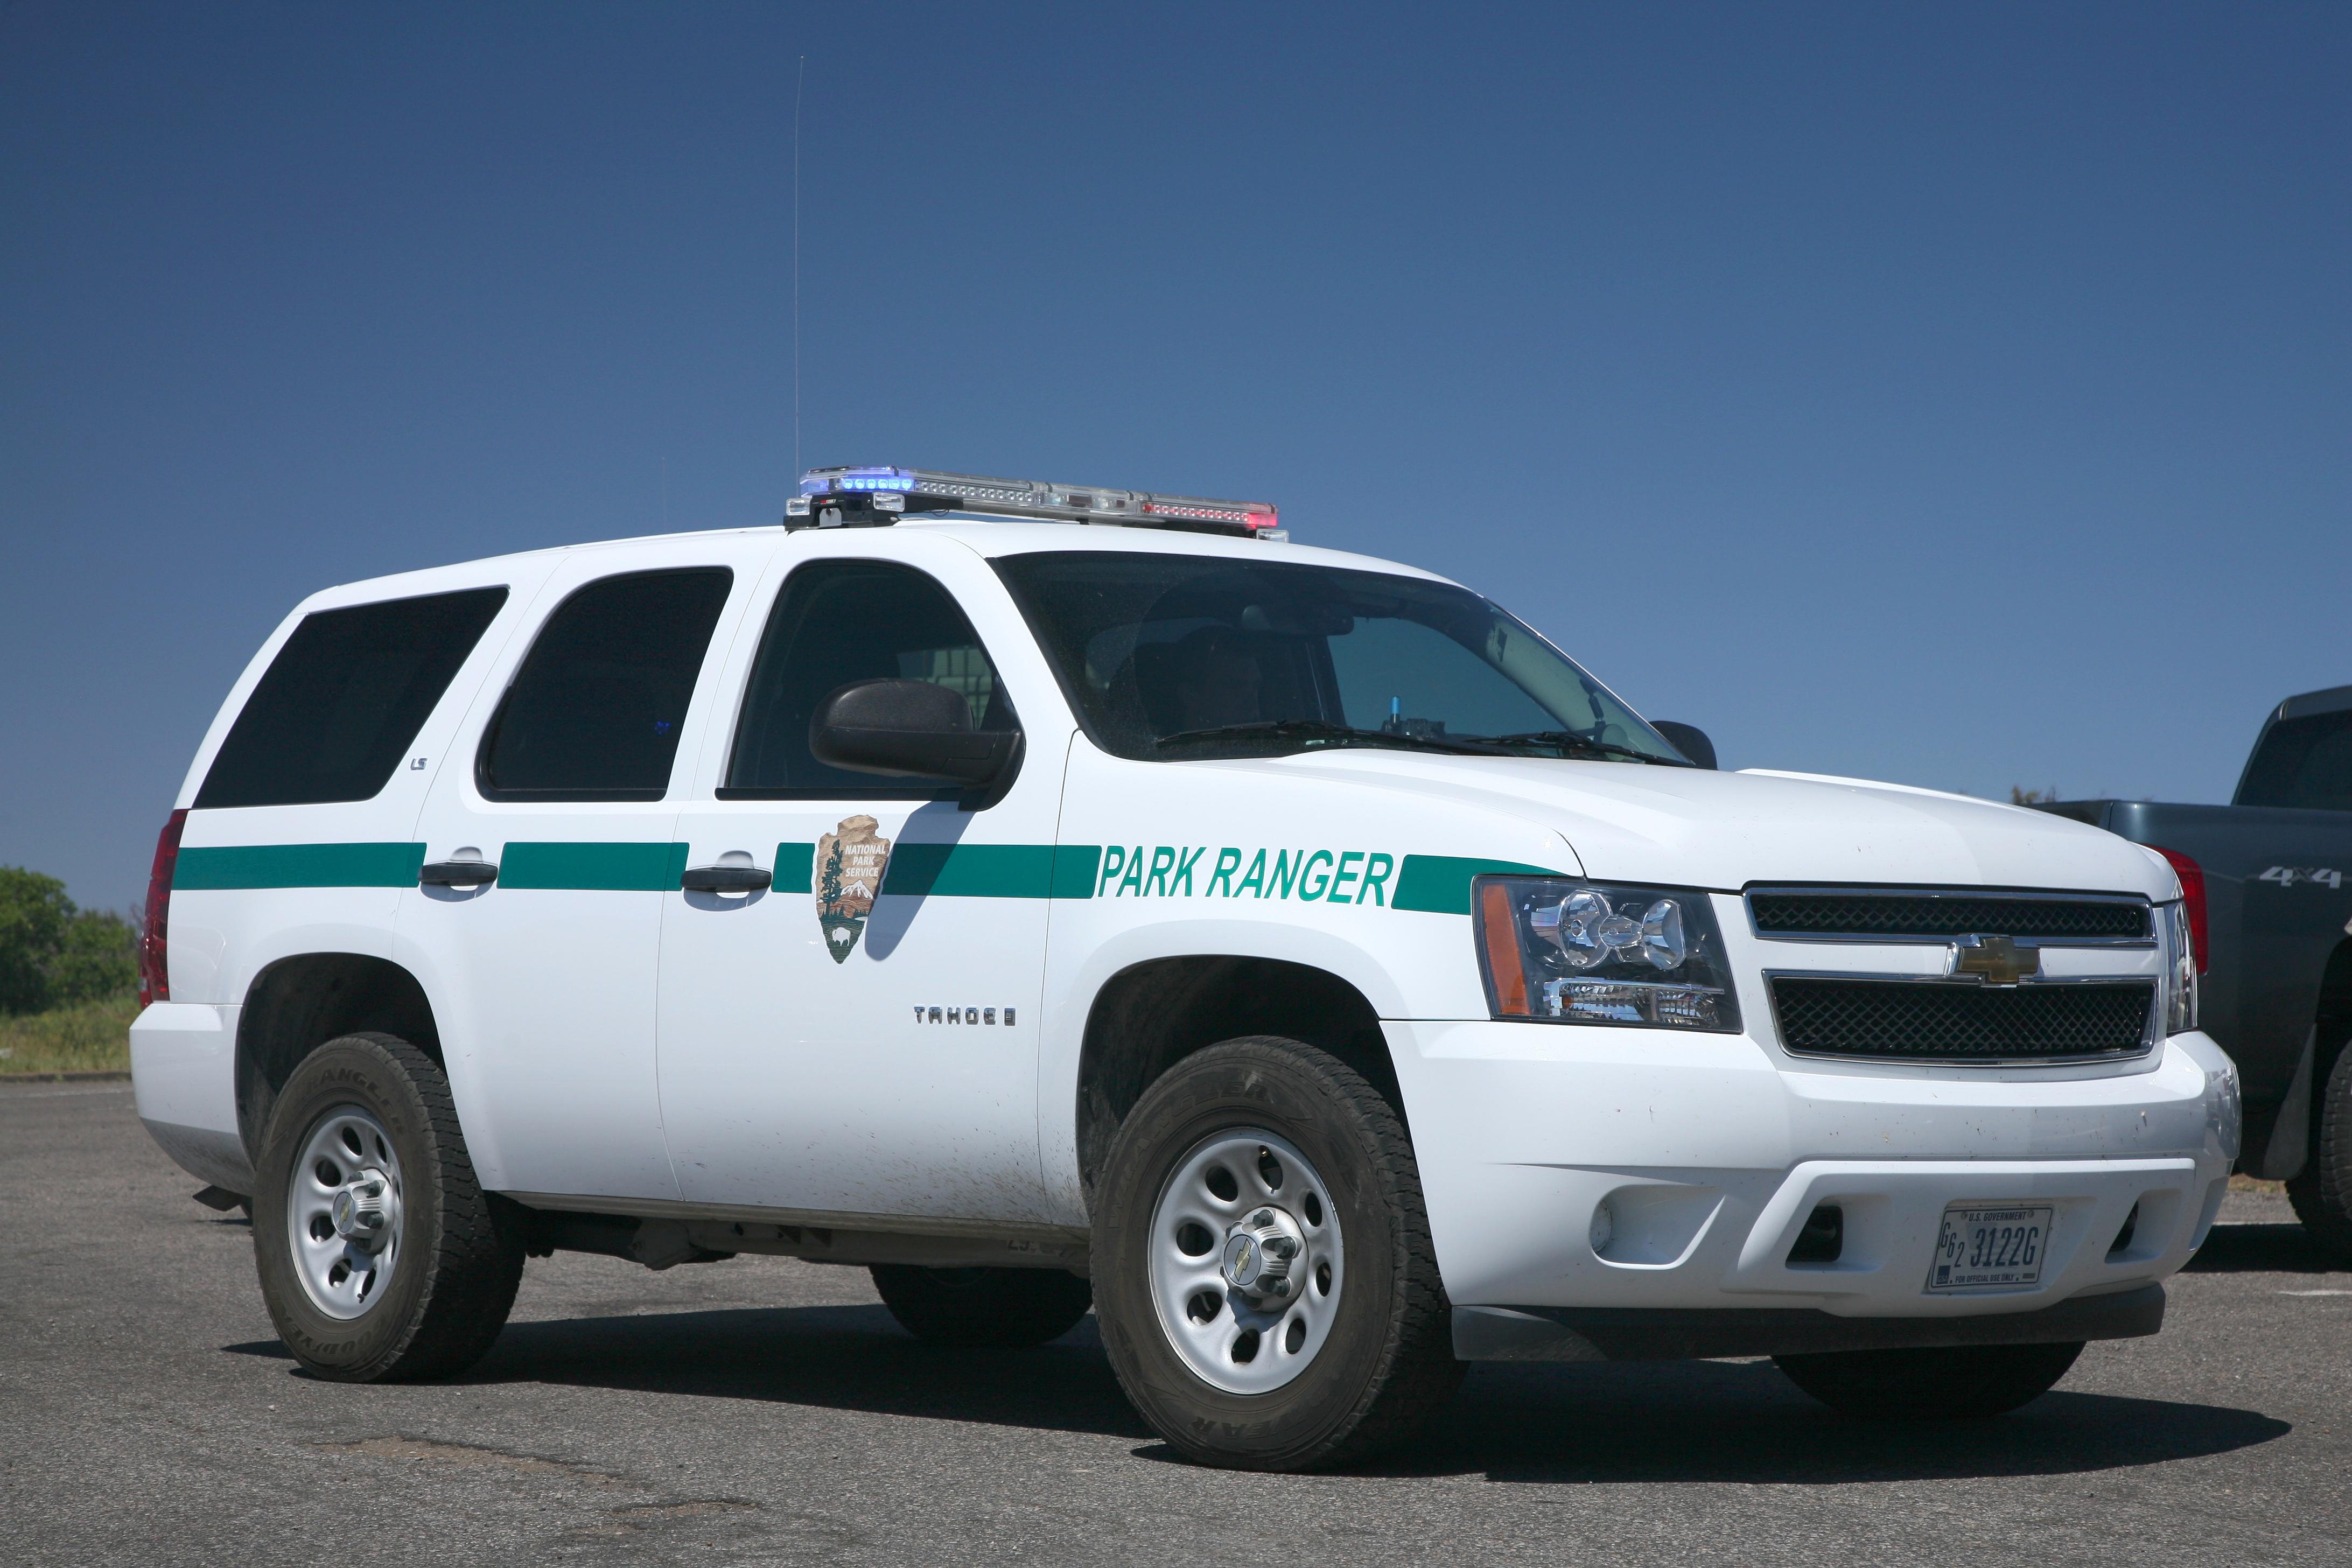 Colorado New Car Registration Grace Period